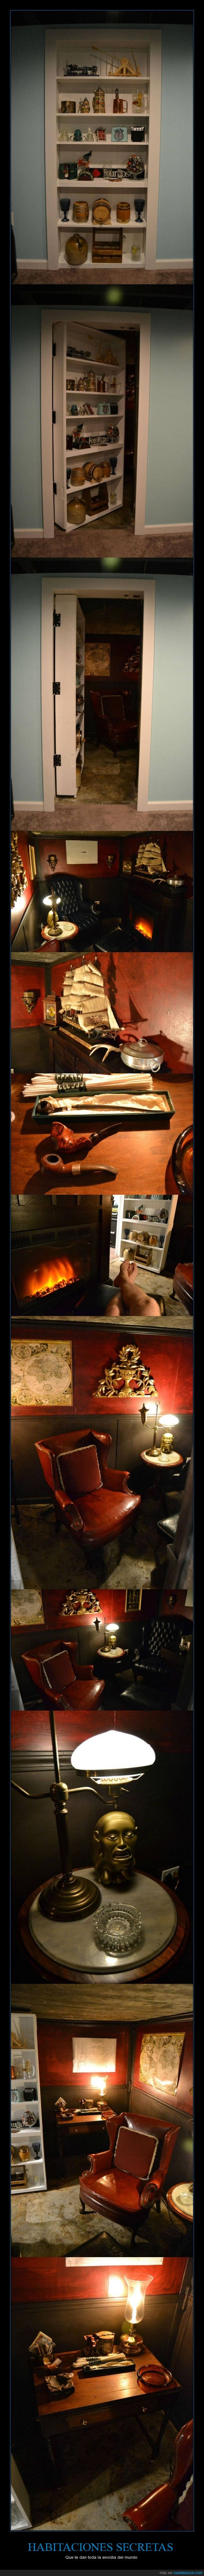 fumar,habitación,idolo,indiana jones,libreria,pipa,secreta,secreto